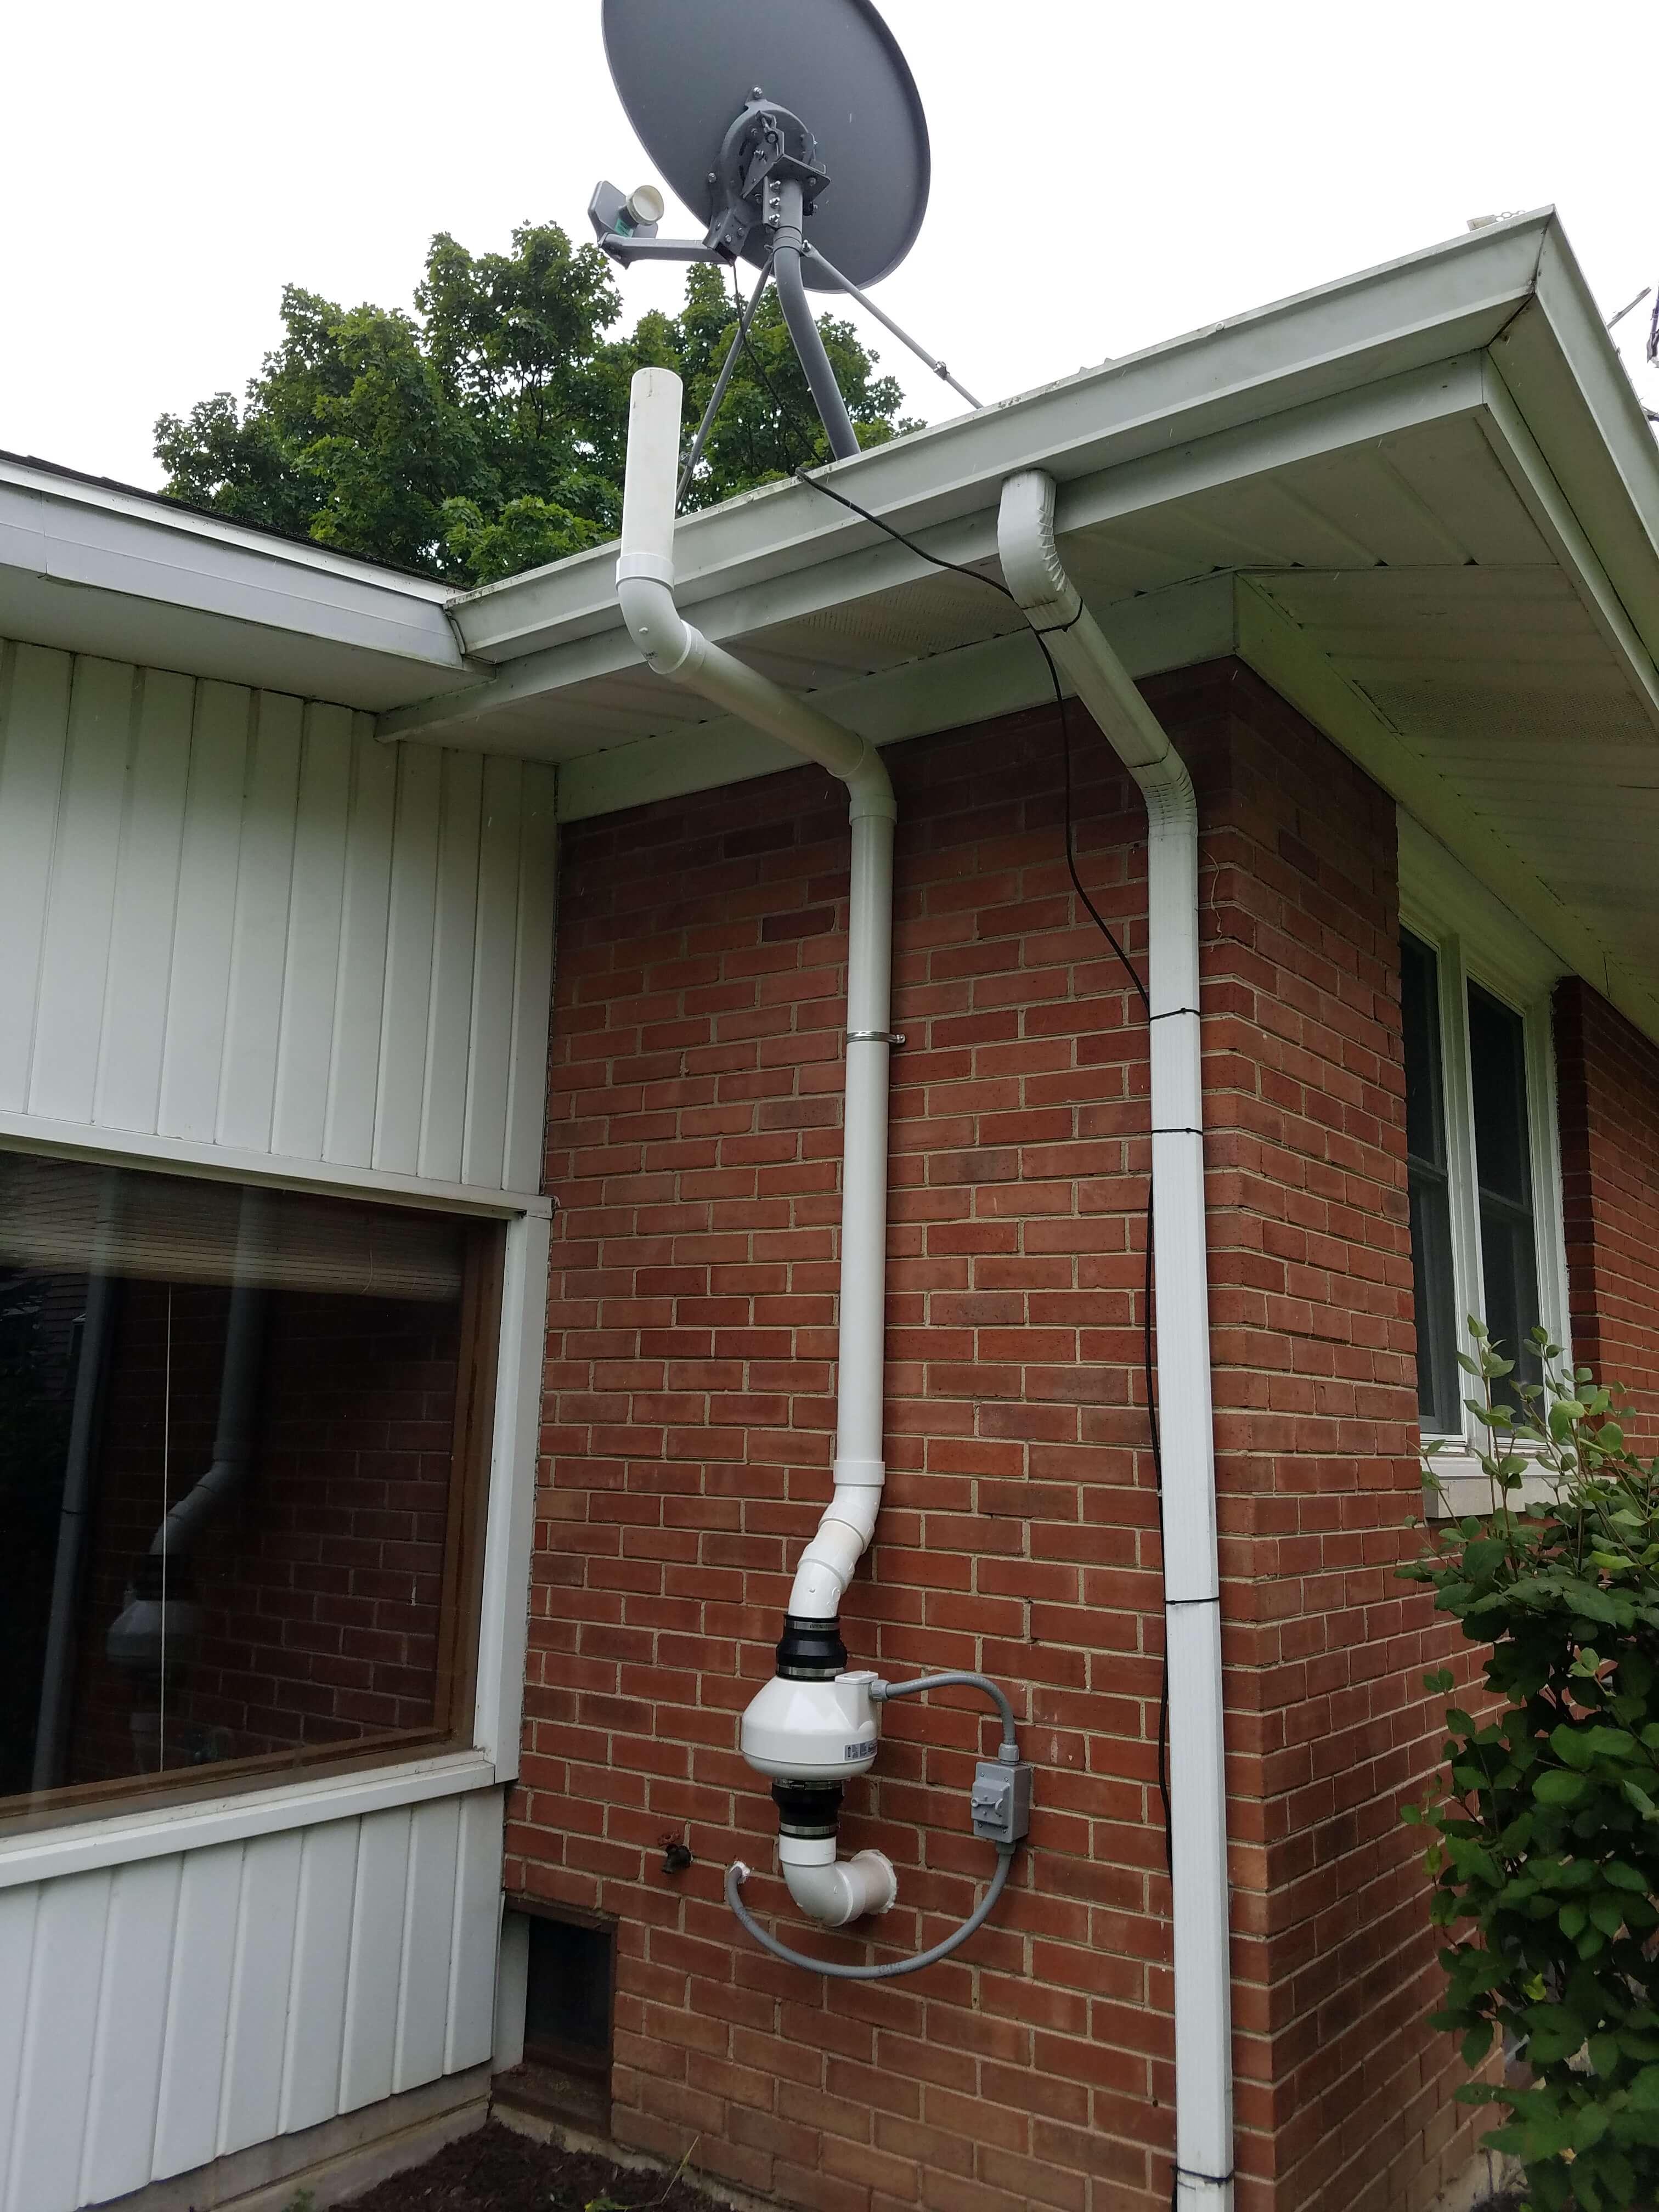 radon mitigation system along brick wall outside